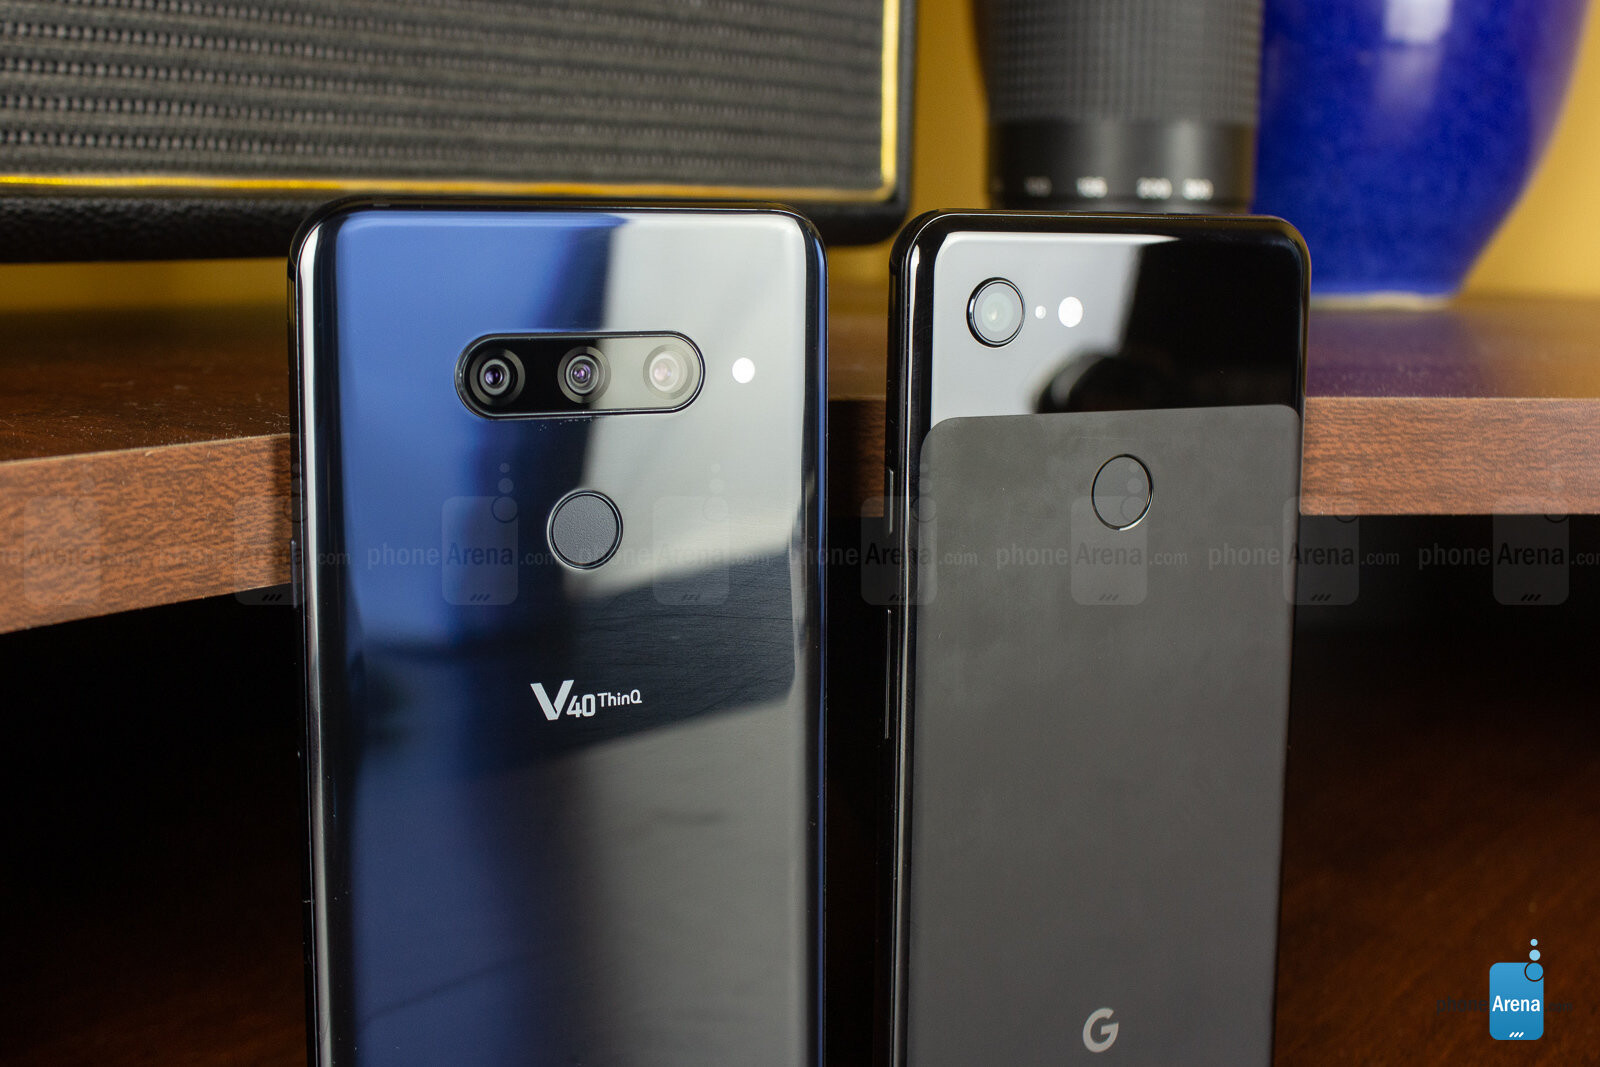 Google Pixel 3 XL vs LG V40 ThinQ - PhoneArena